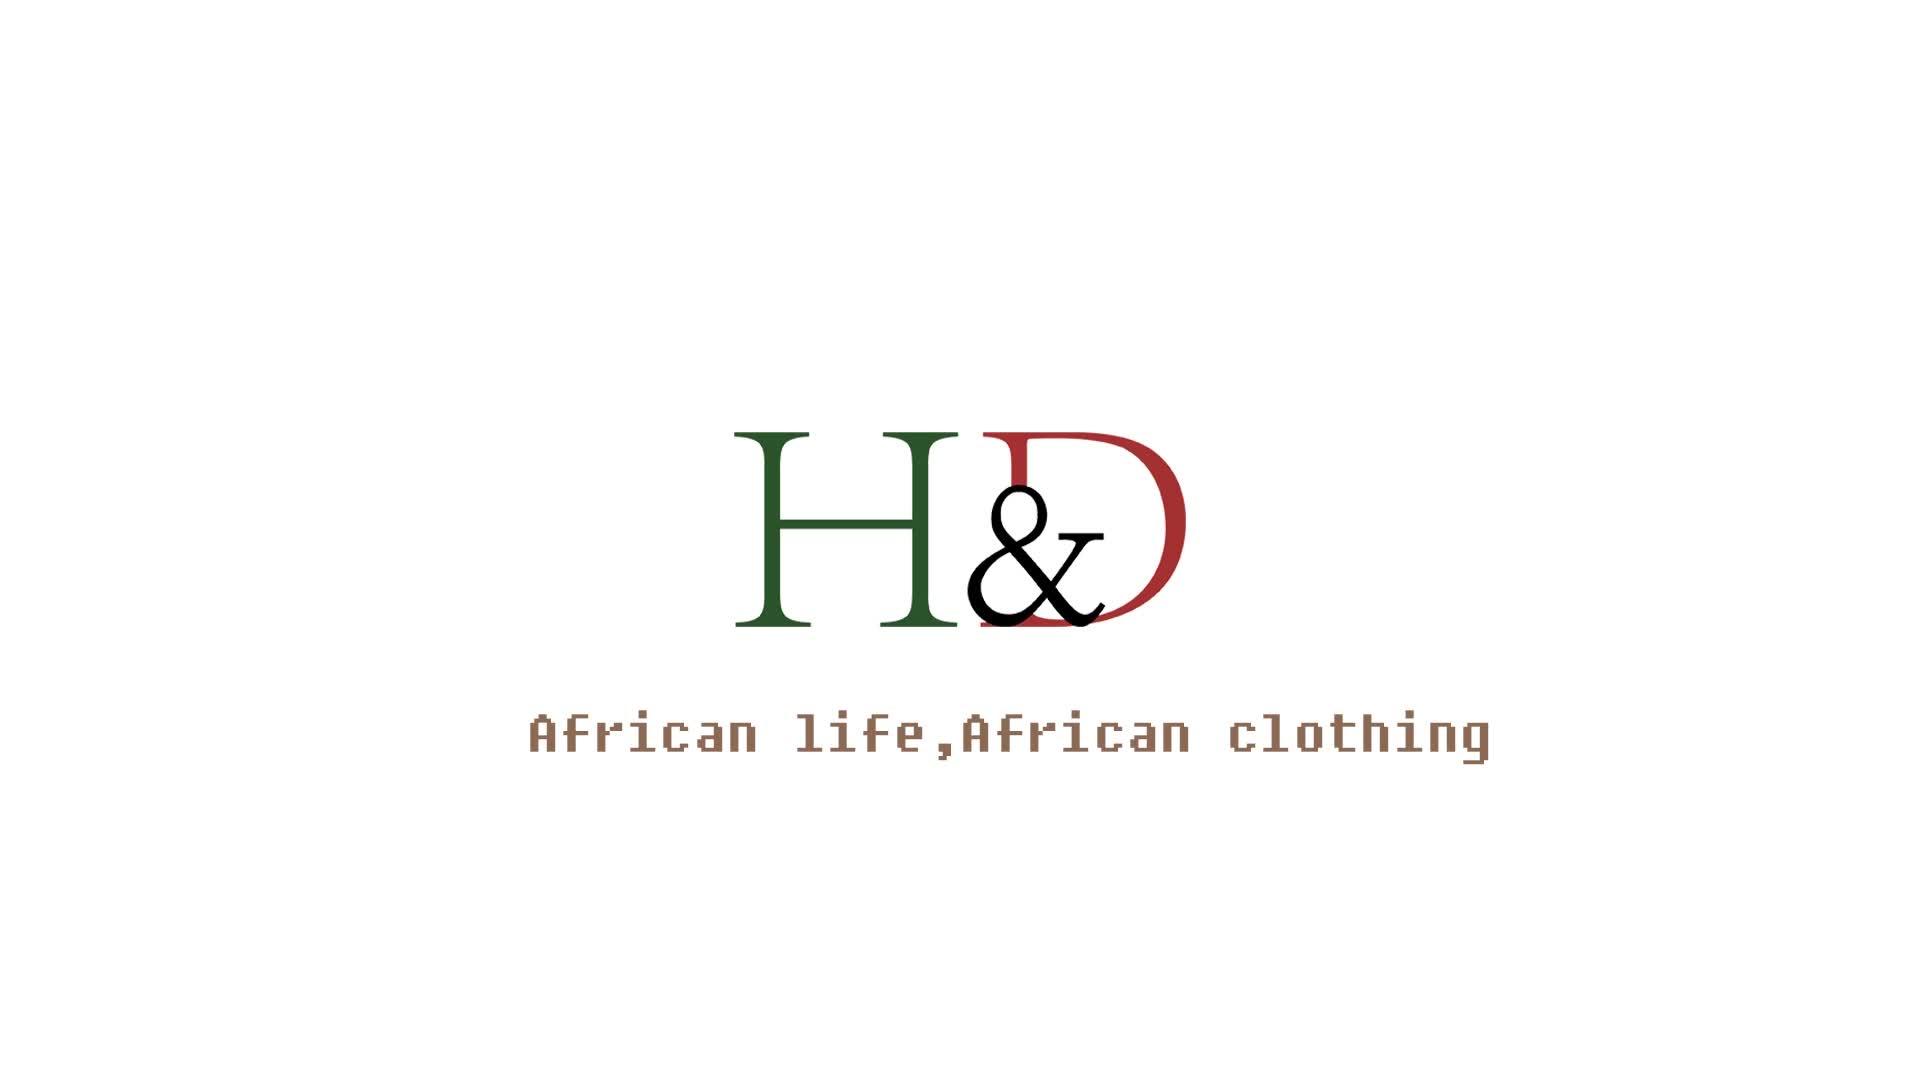 H & dマッチング服家族マッチング衣類マッチング家族服セット父と息子マッチング服